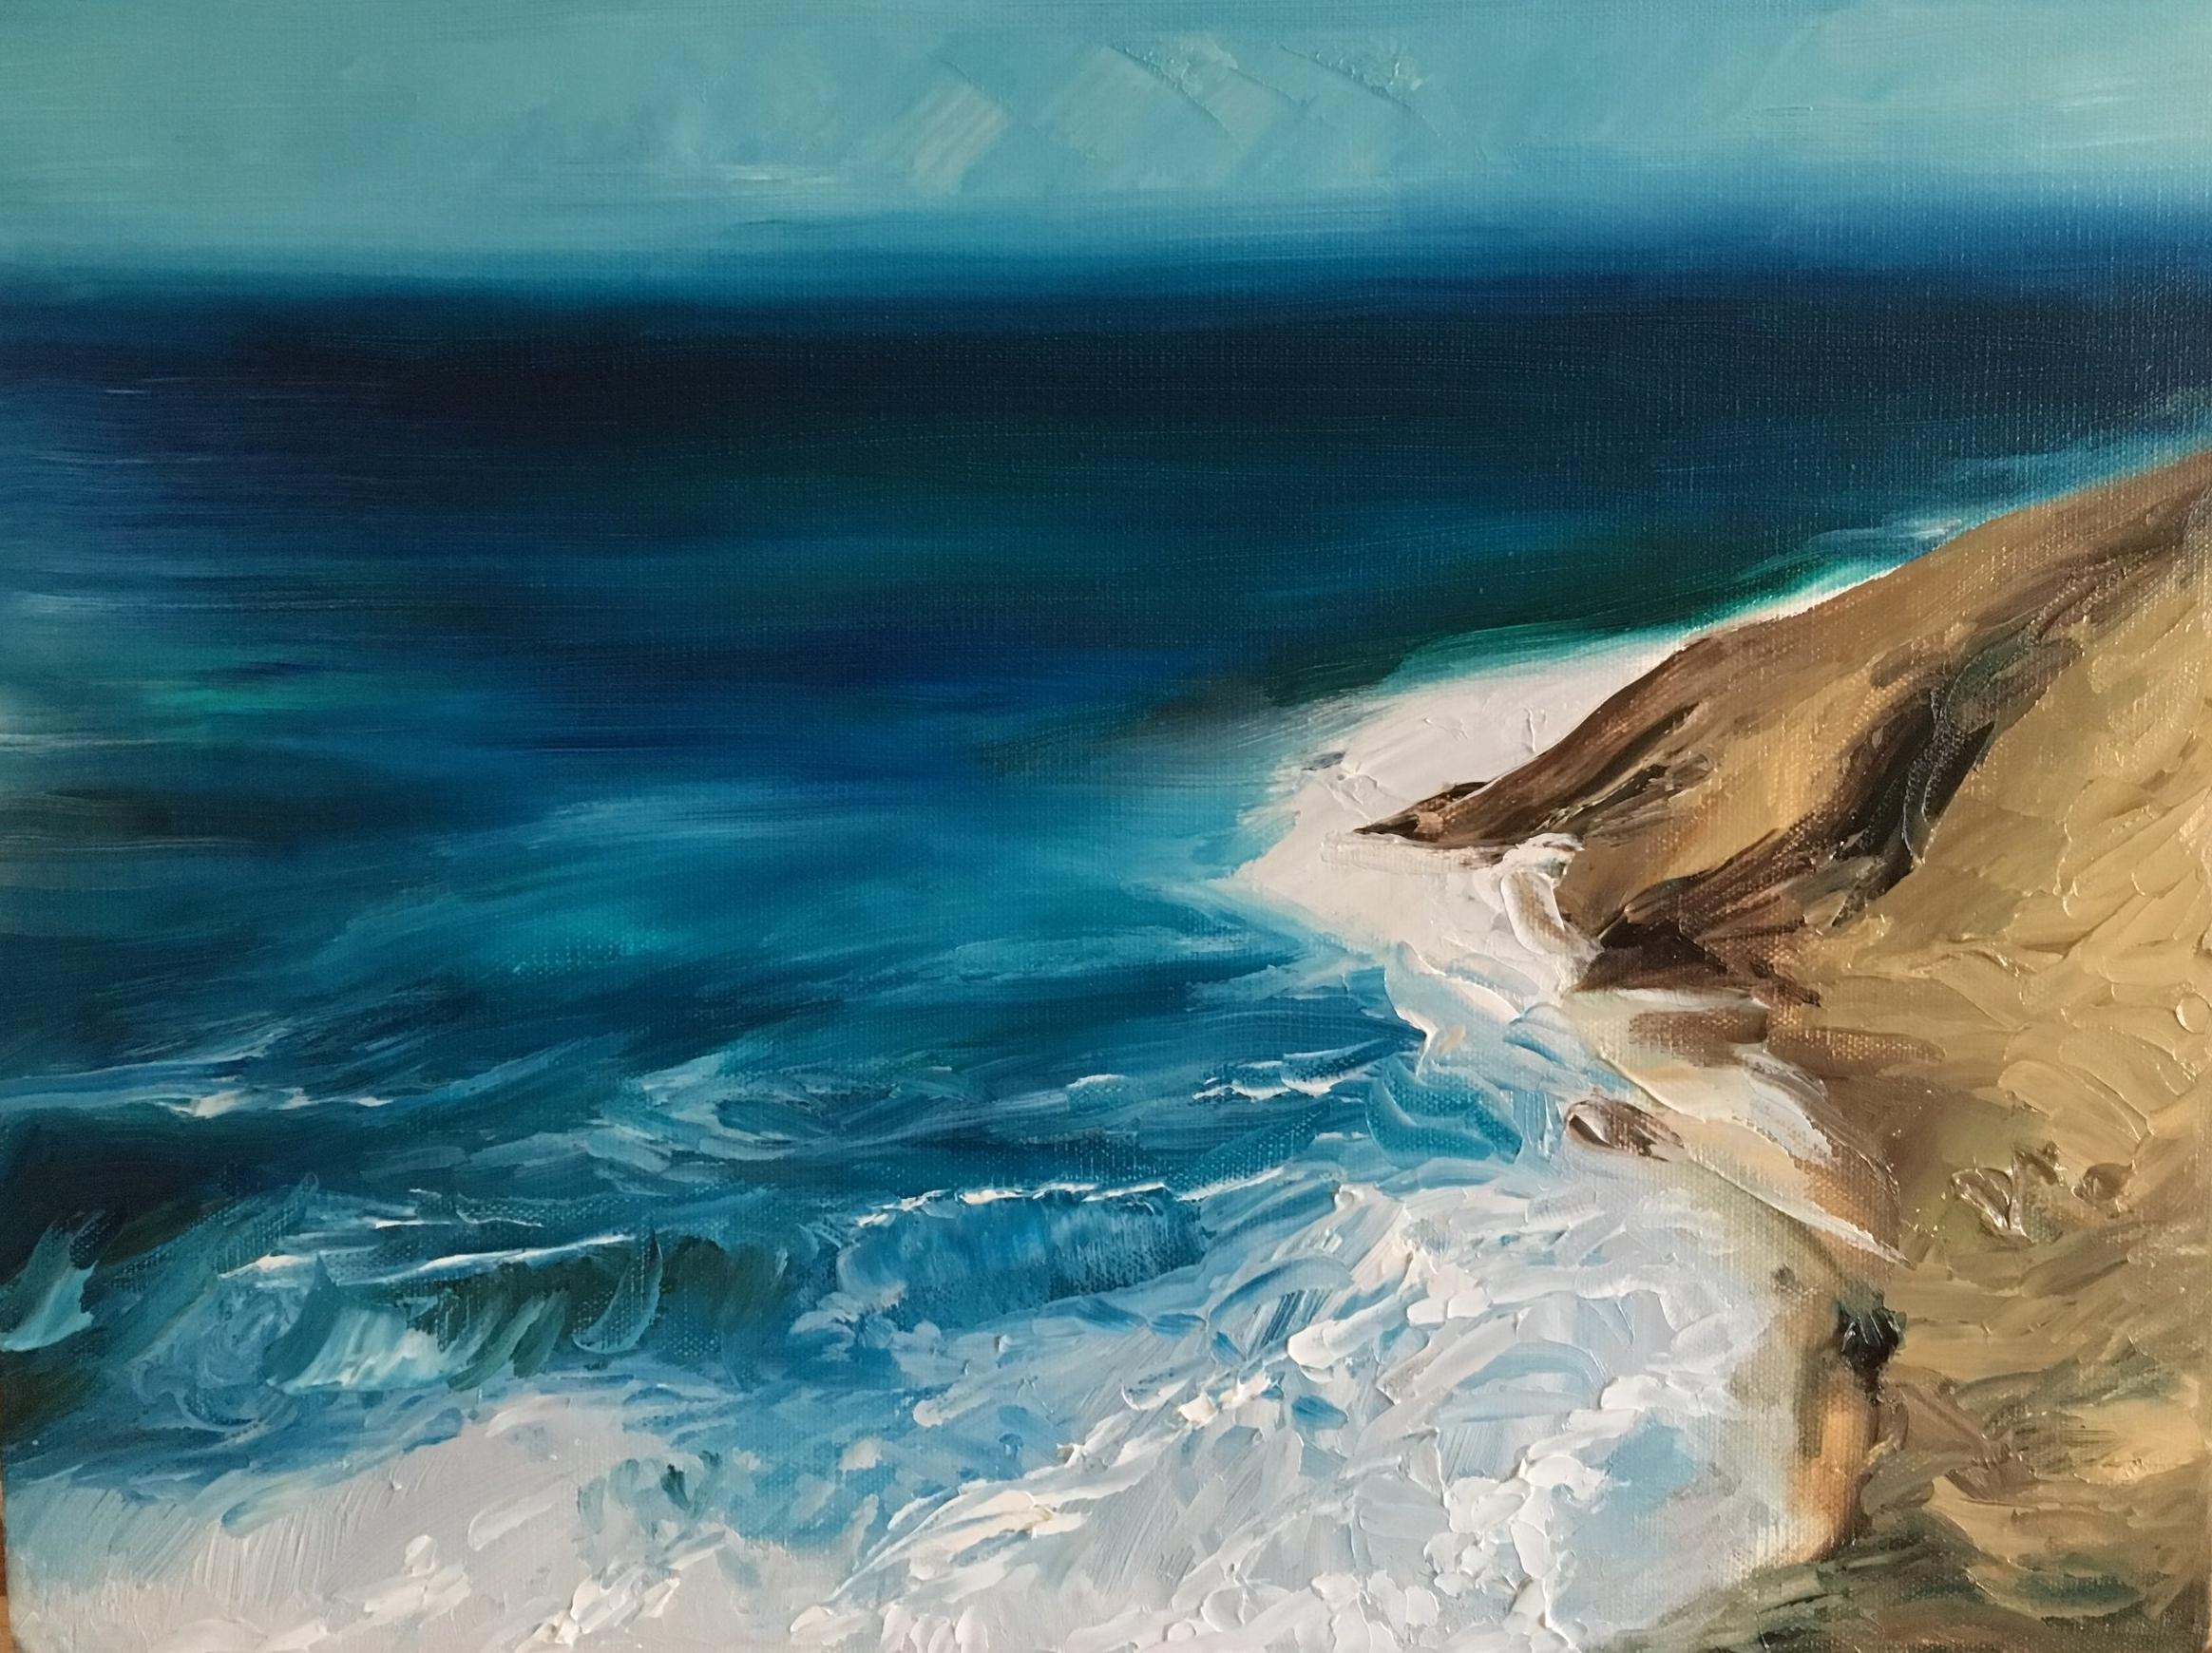 "Foamy sun, 12 x 9"" oil on canvas"